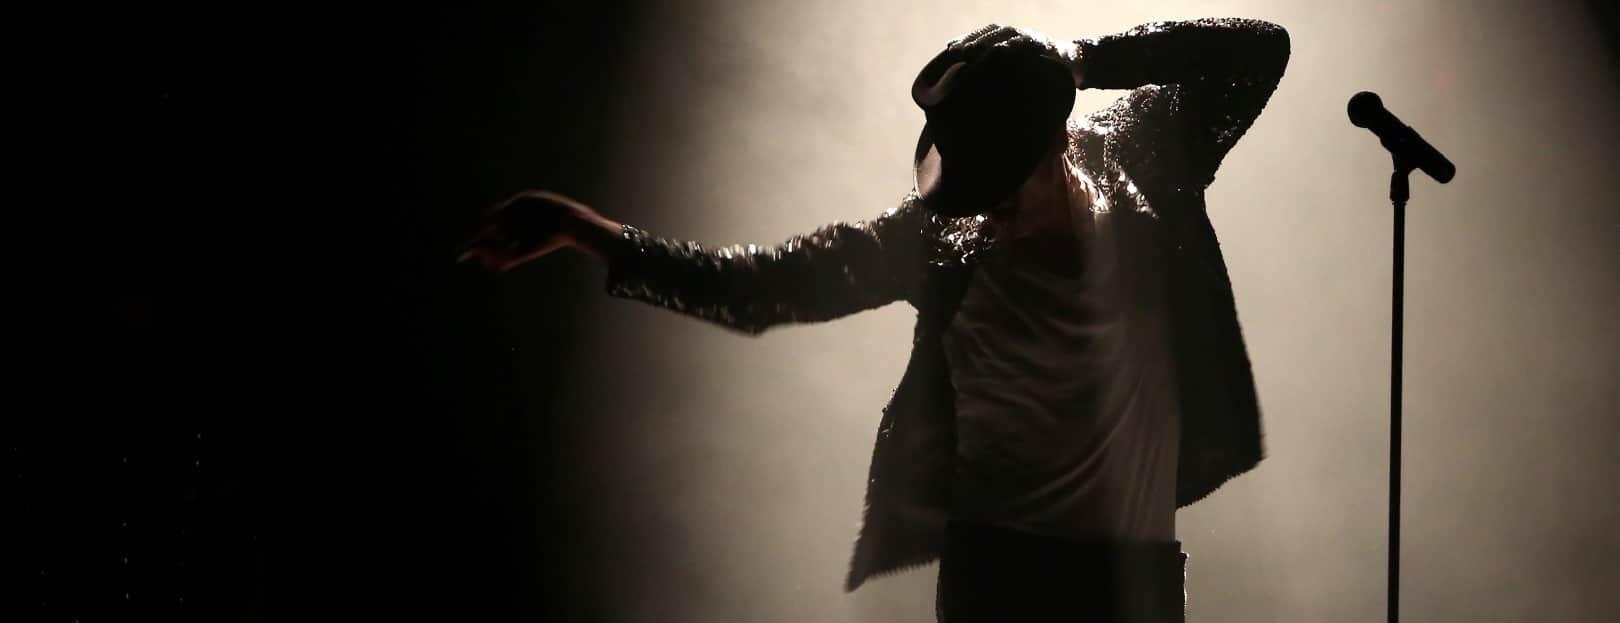 Contact TJ Michael Jackson